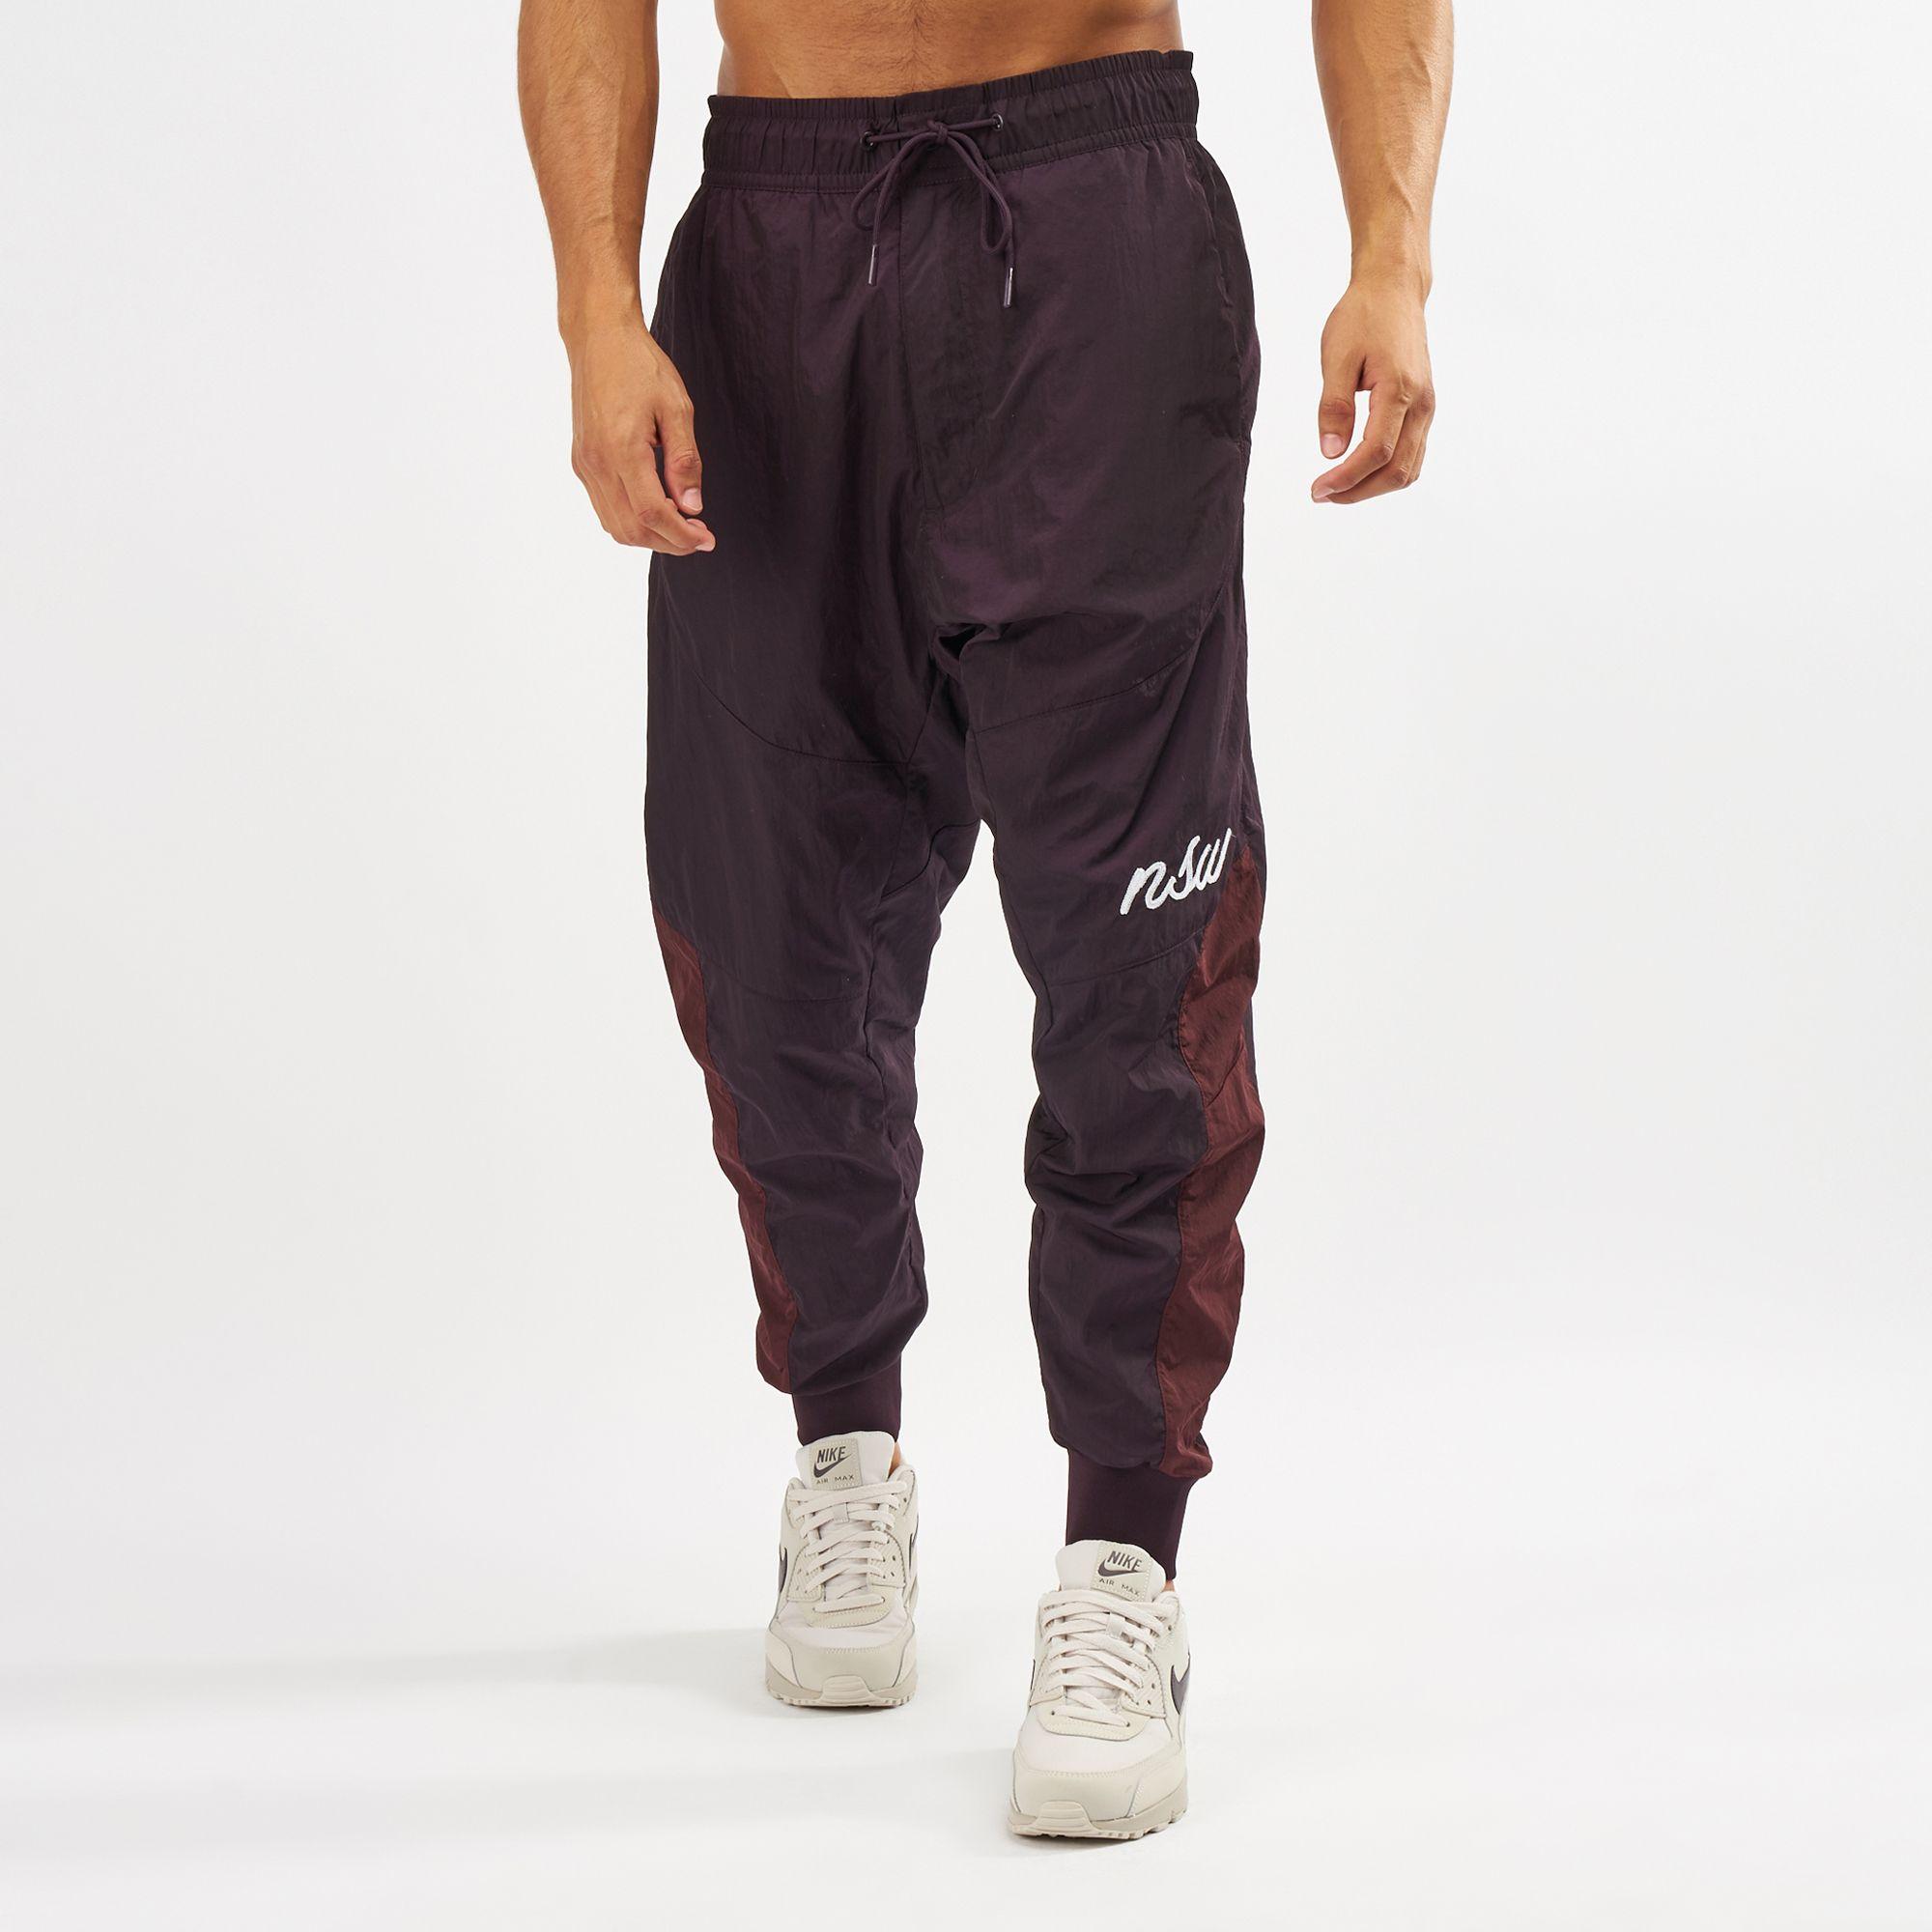 violencia avaro vistazo  Nike Sportswear Woven Joggers | Track Pants | Pants | Clothing ...